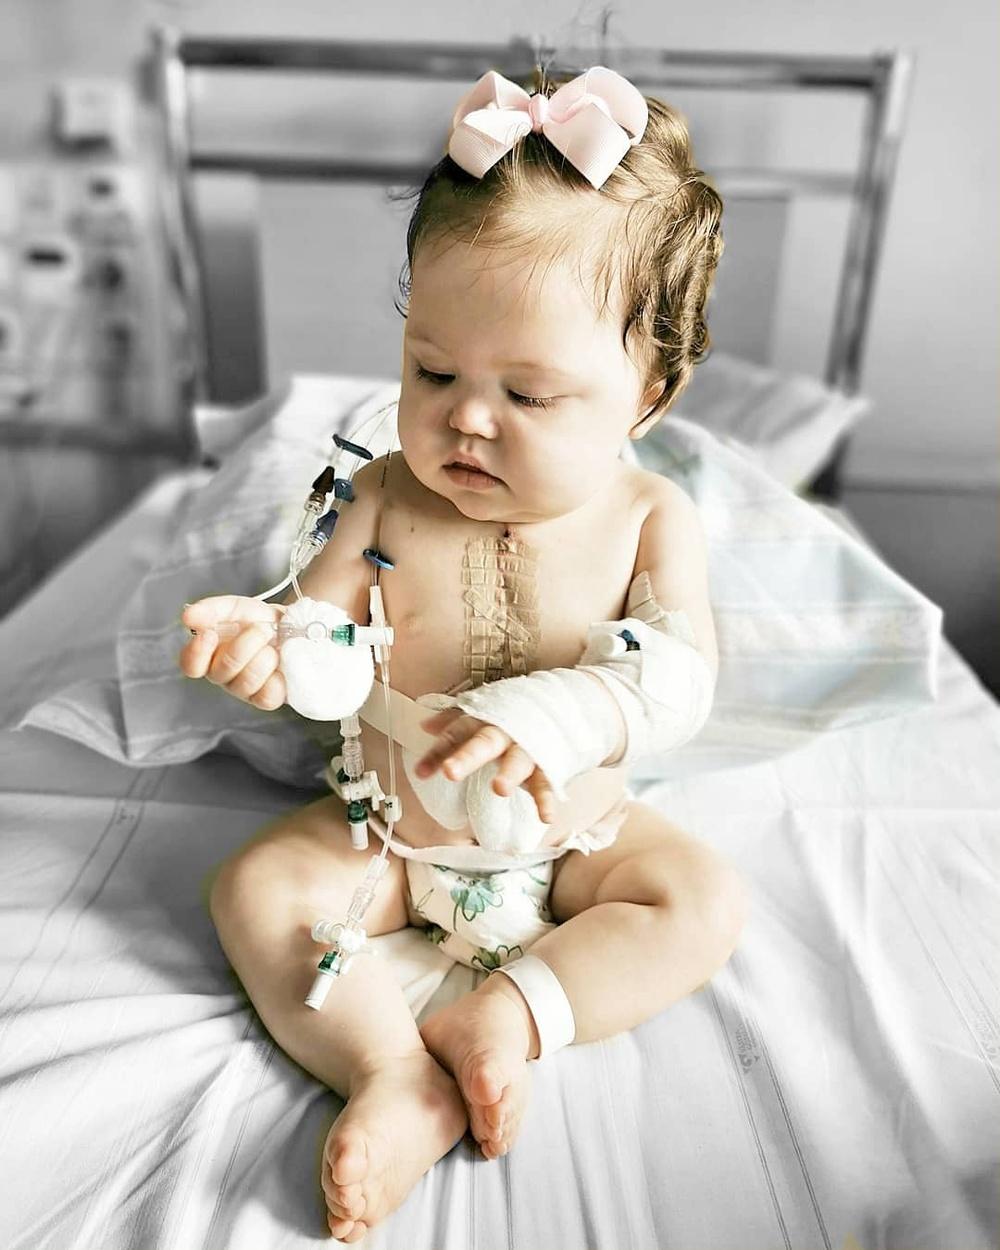 Hjärtebarnet Hailey